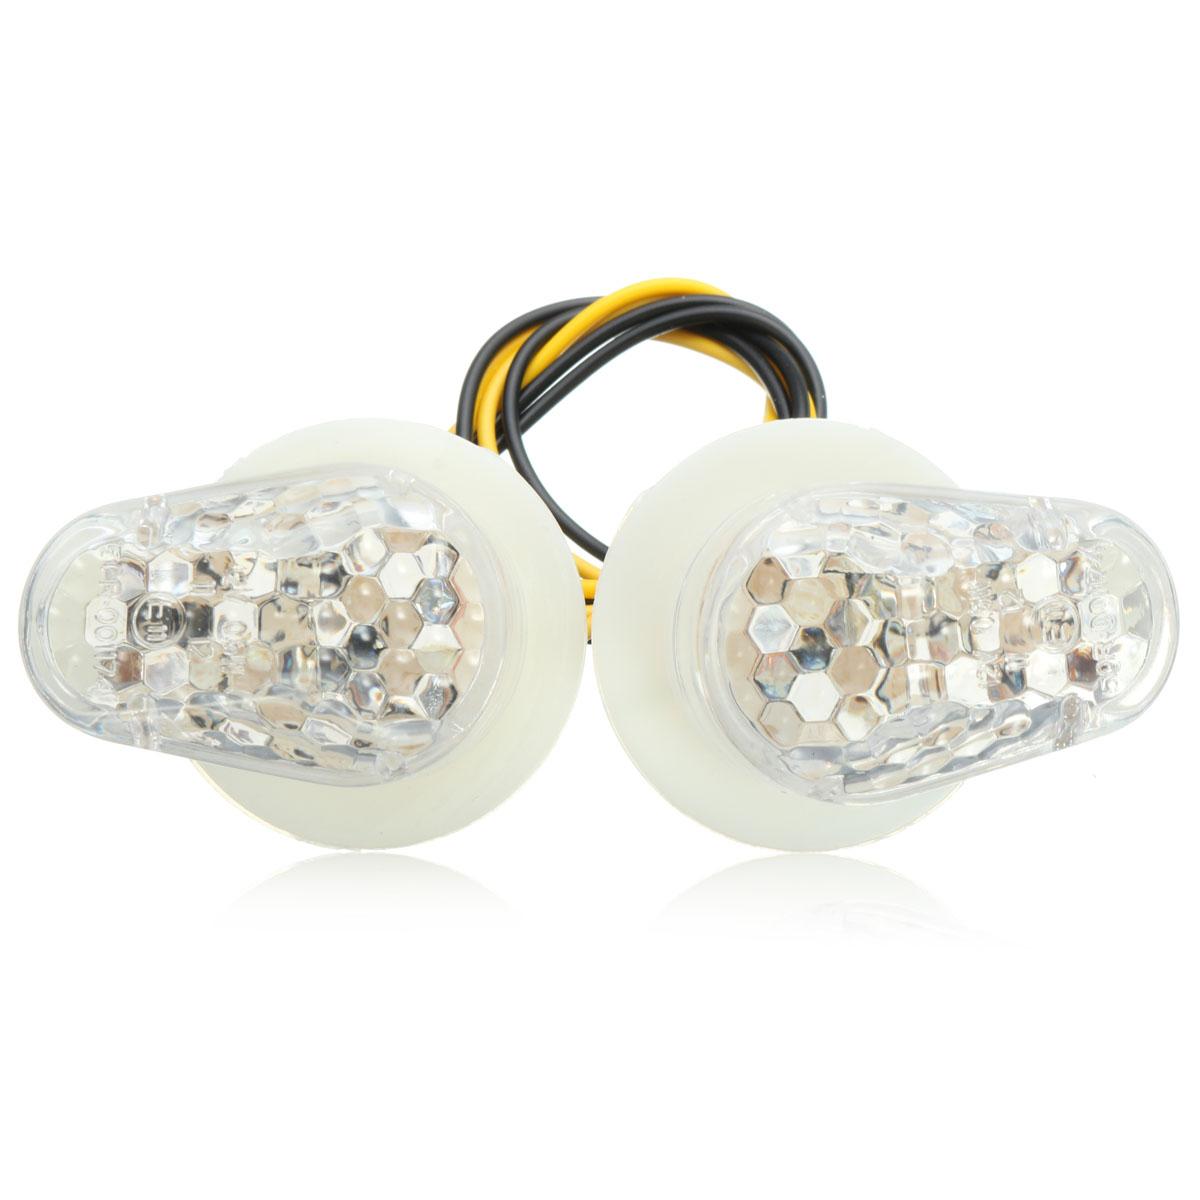 Flush Mount LED Turn Signal Light Indicator For Yamaha FZ6R FZ1 YZF R1 R6 R6S